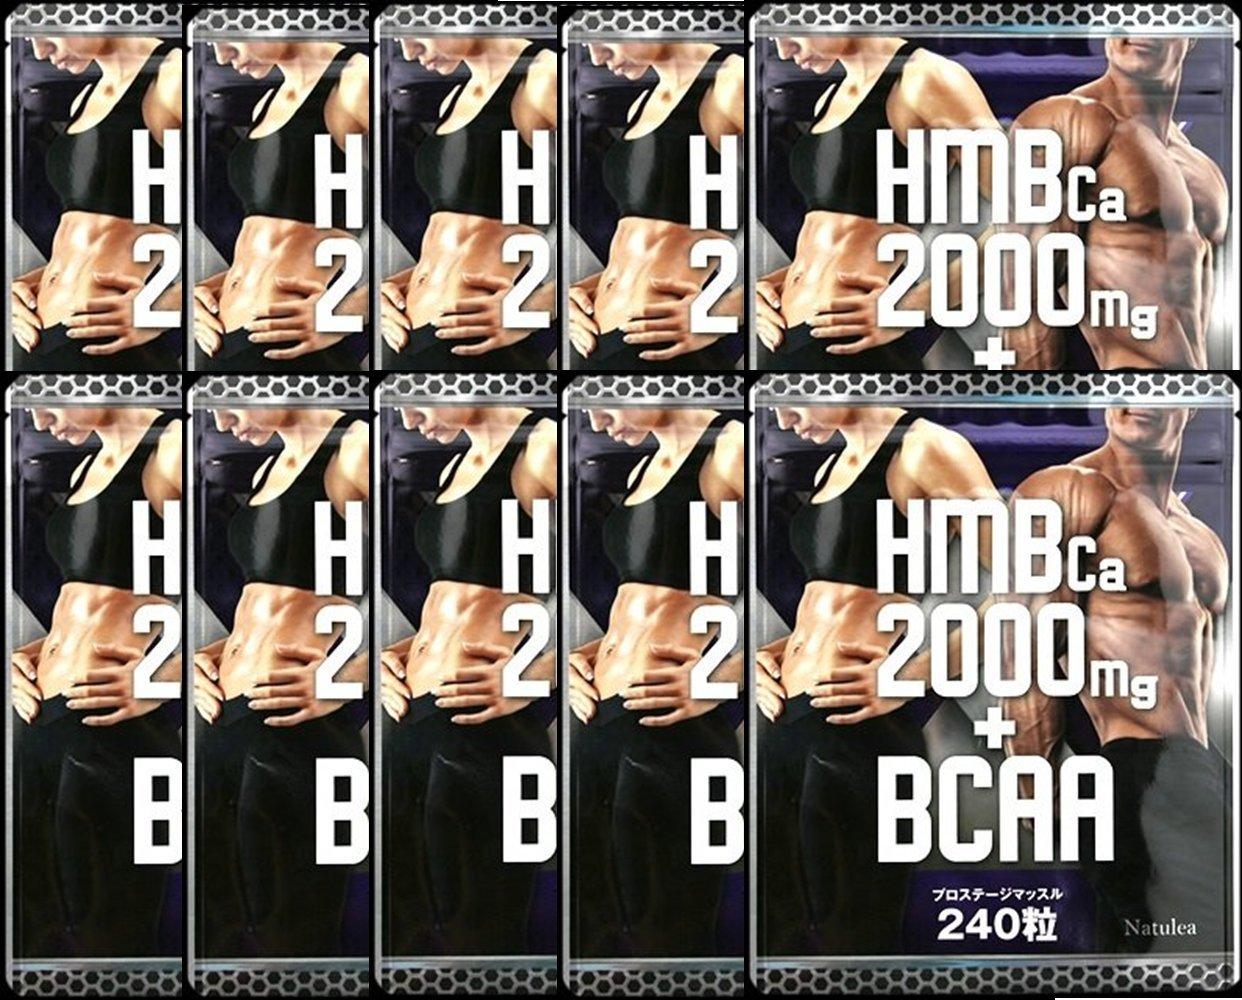 HMB 2000mg 30日分 国内製造 プロステージマッスル 240粒 1袋60000mg (5袋) B073TVRJPF 5袋  5袋